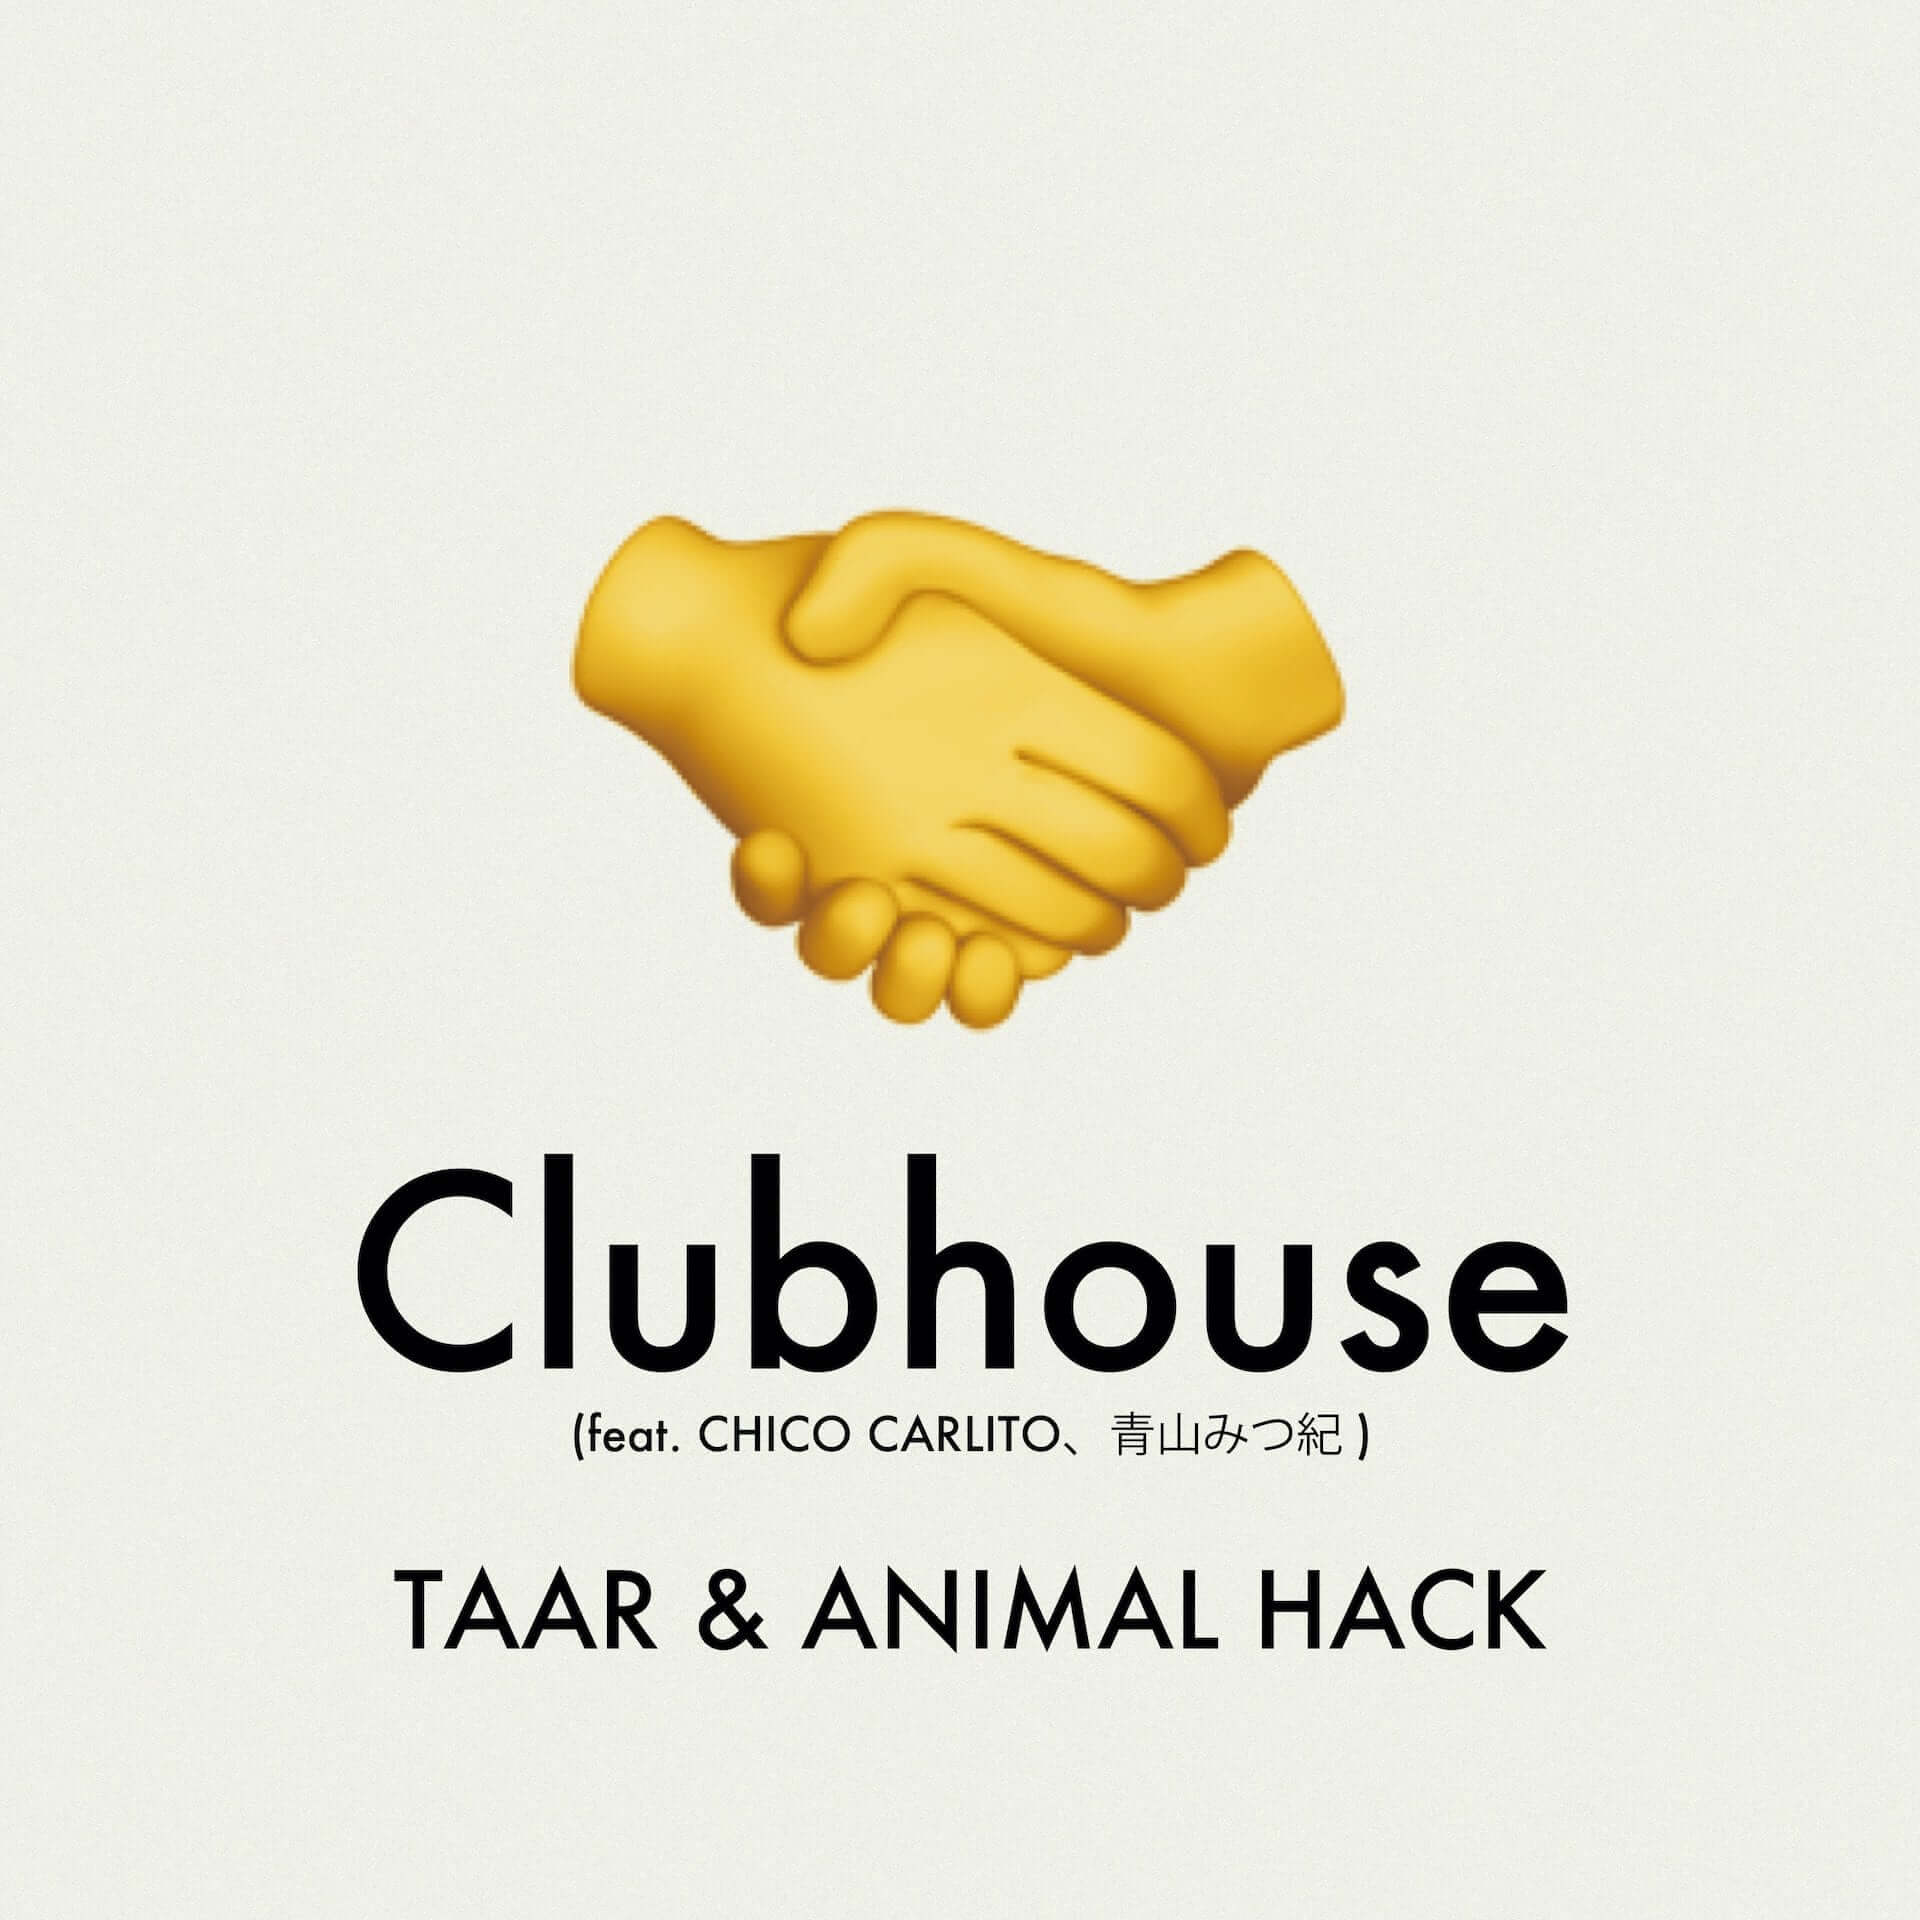 Clubhouseでの共同制作で話題のTAAR & ANIMAL HACKがリミックス募集プロジェクト「#ReroomProject」を発足!ステム&オケデータが公開 music210212_reroomproject_5-1920x1920